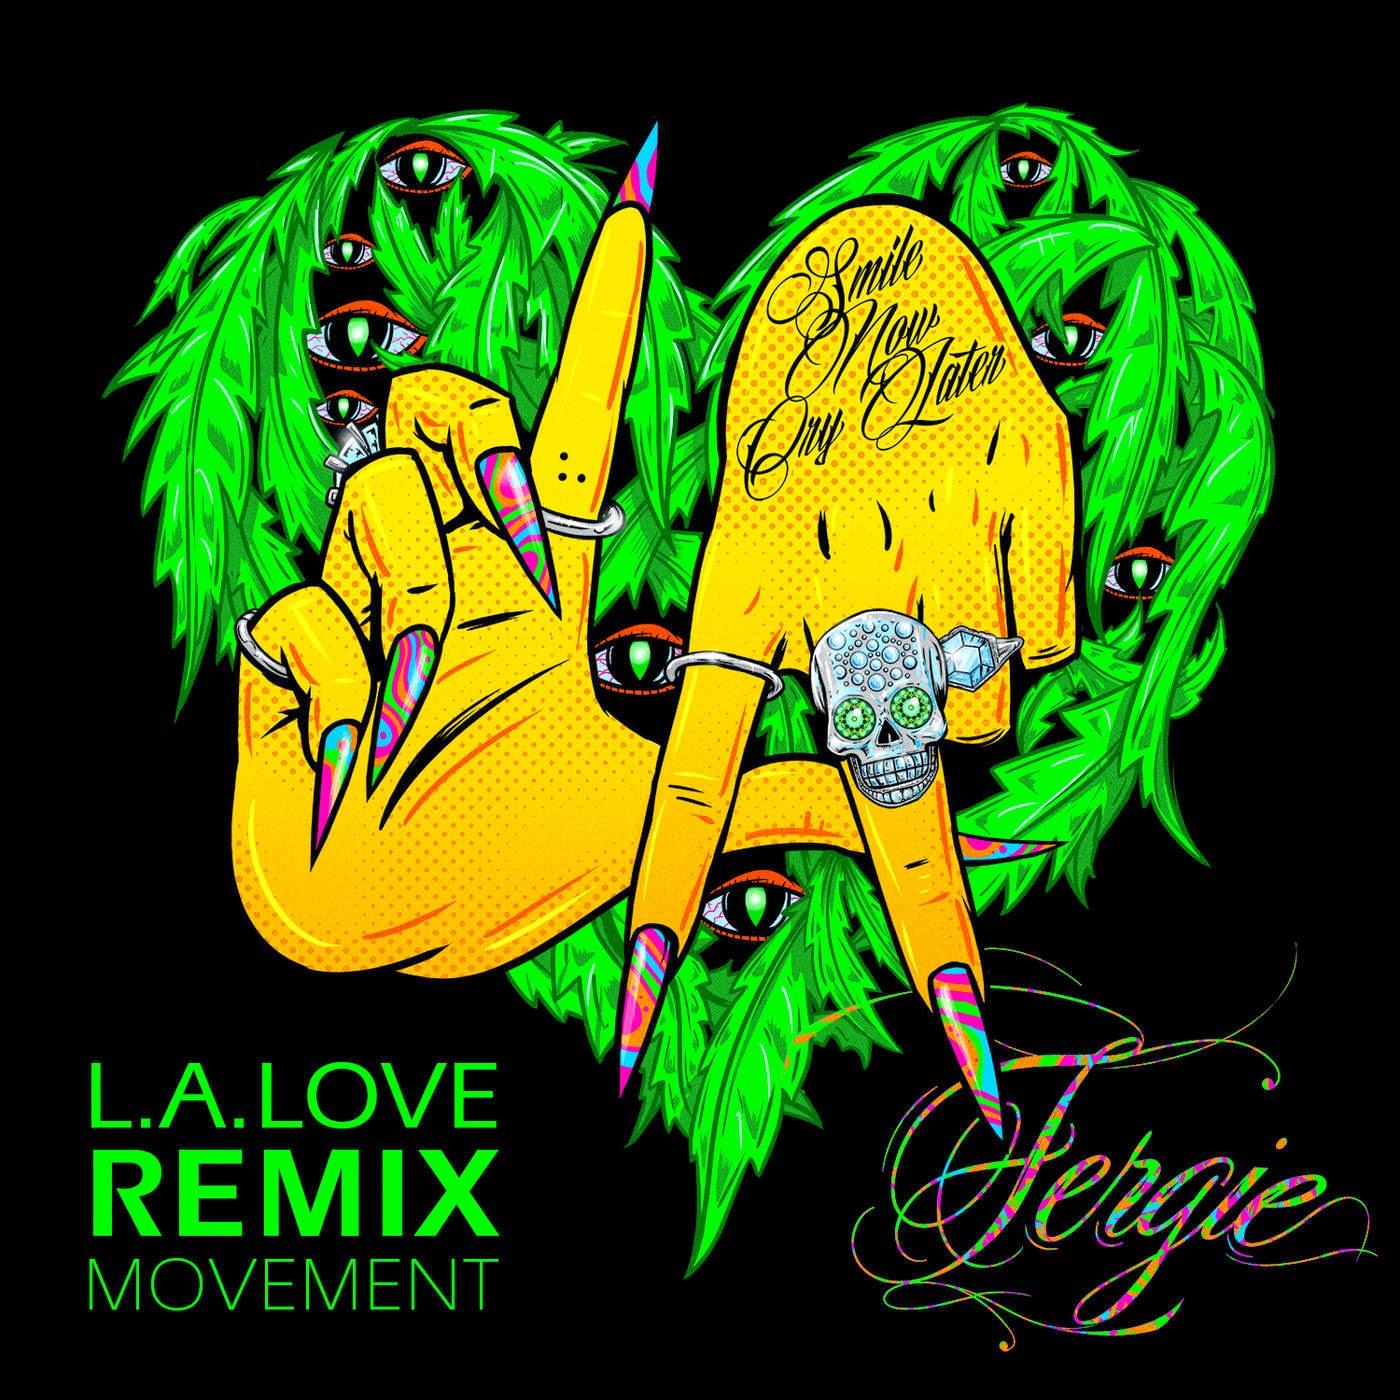 Fergie - L.A.LOVE (la la) [Remix Movement] - EP Cover